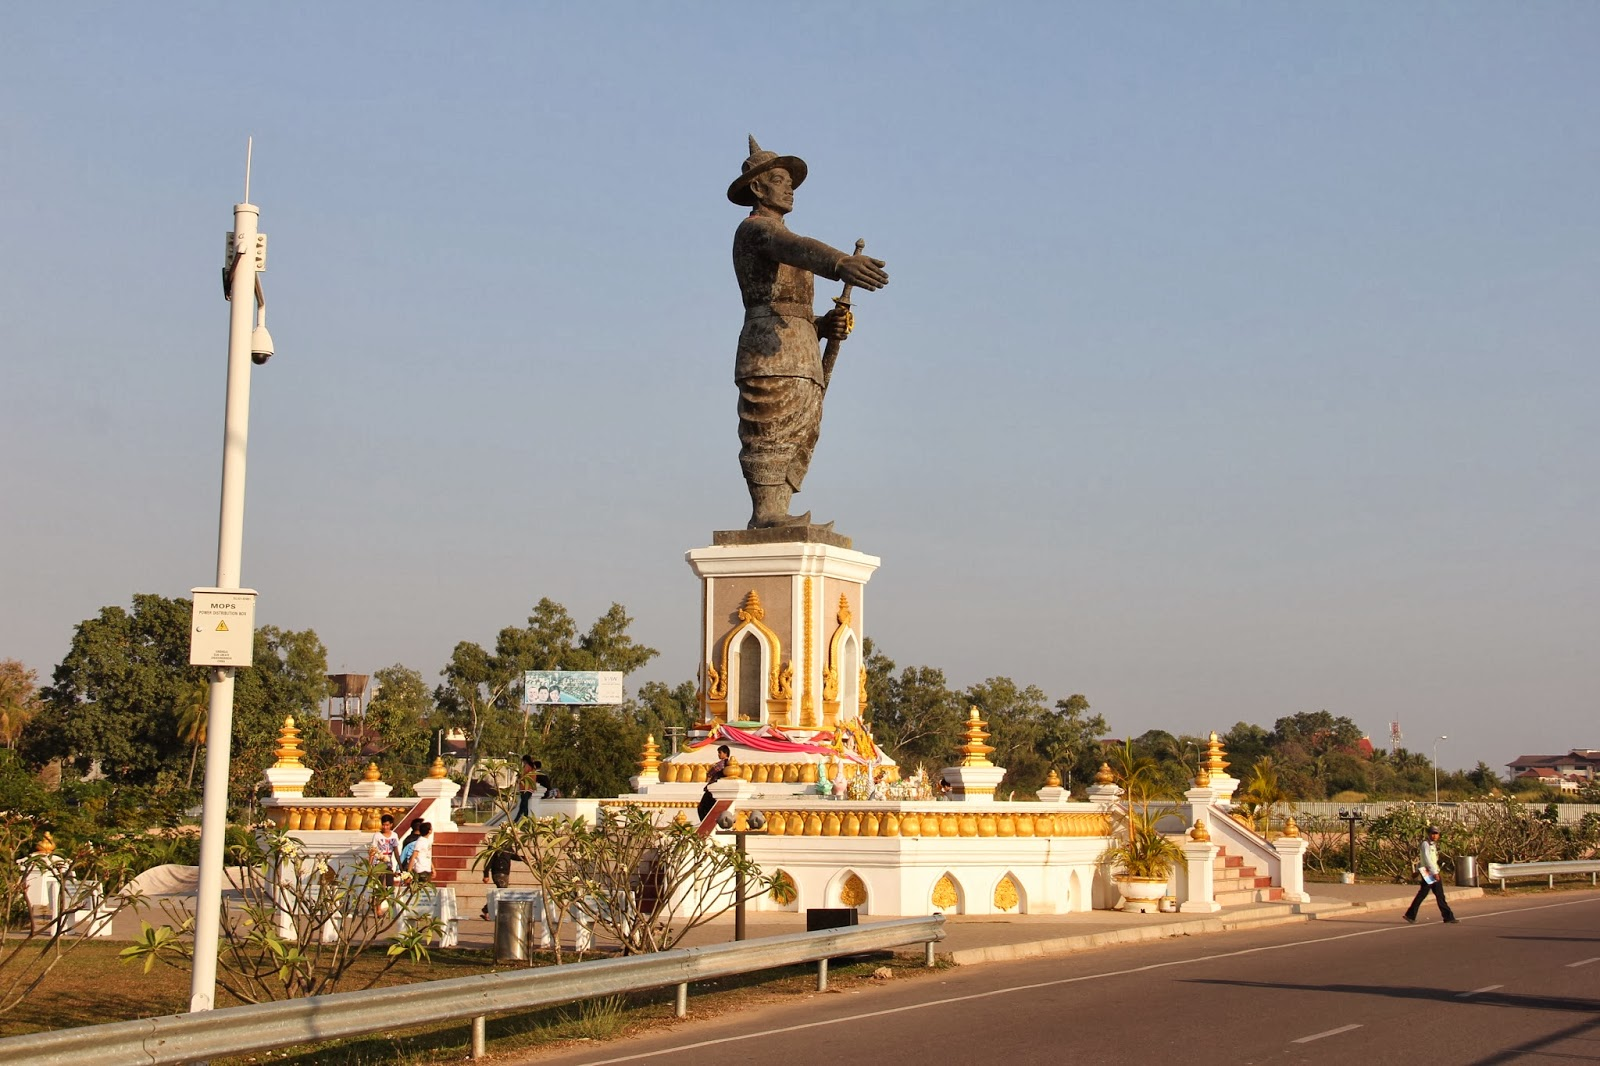 Riverside Park in Vientiane, Laos